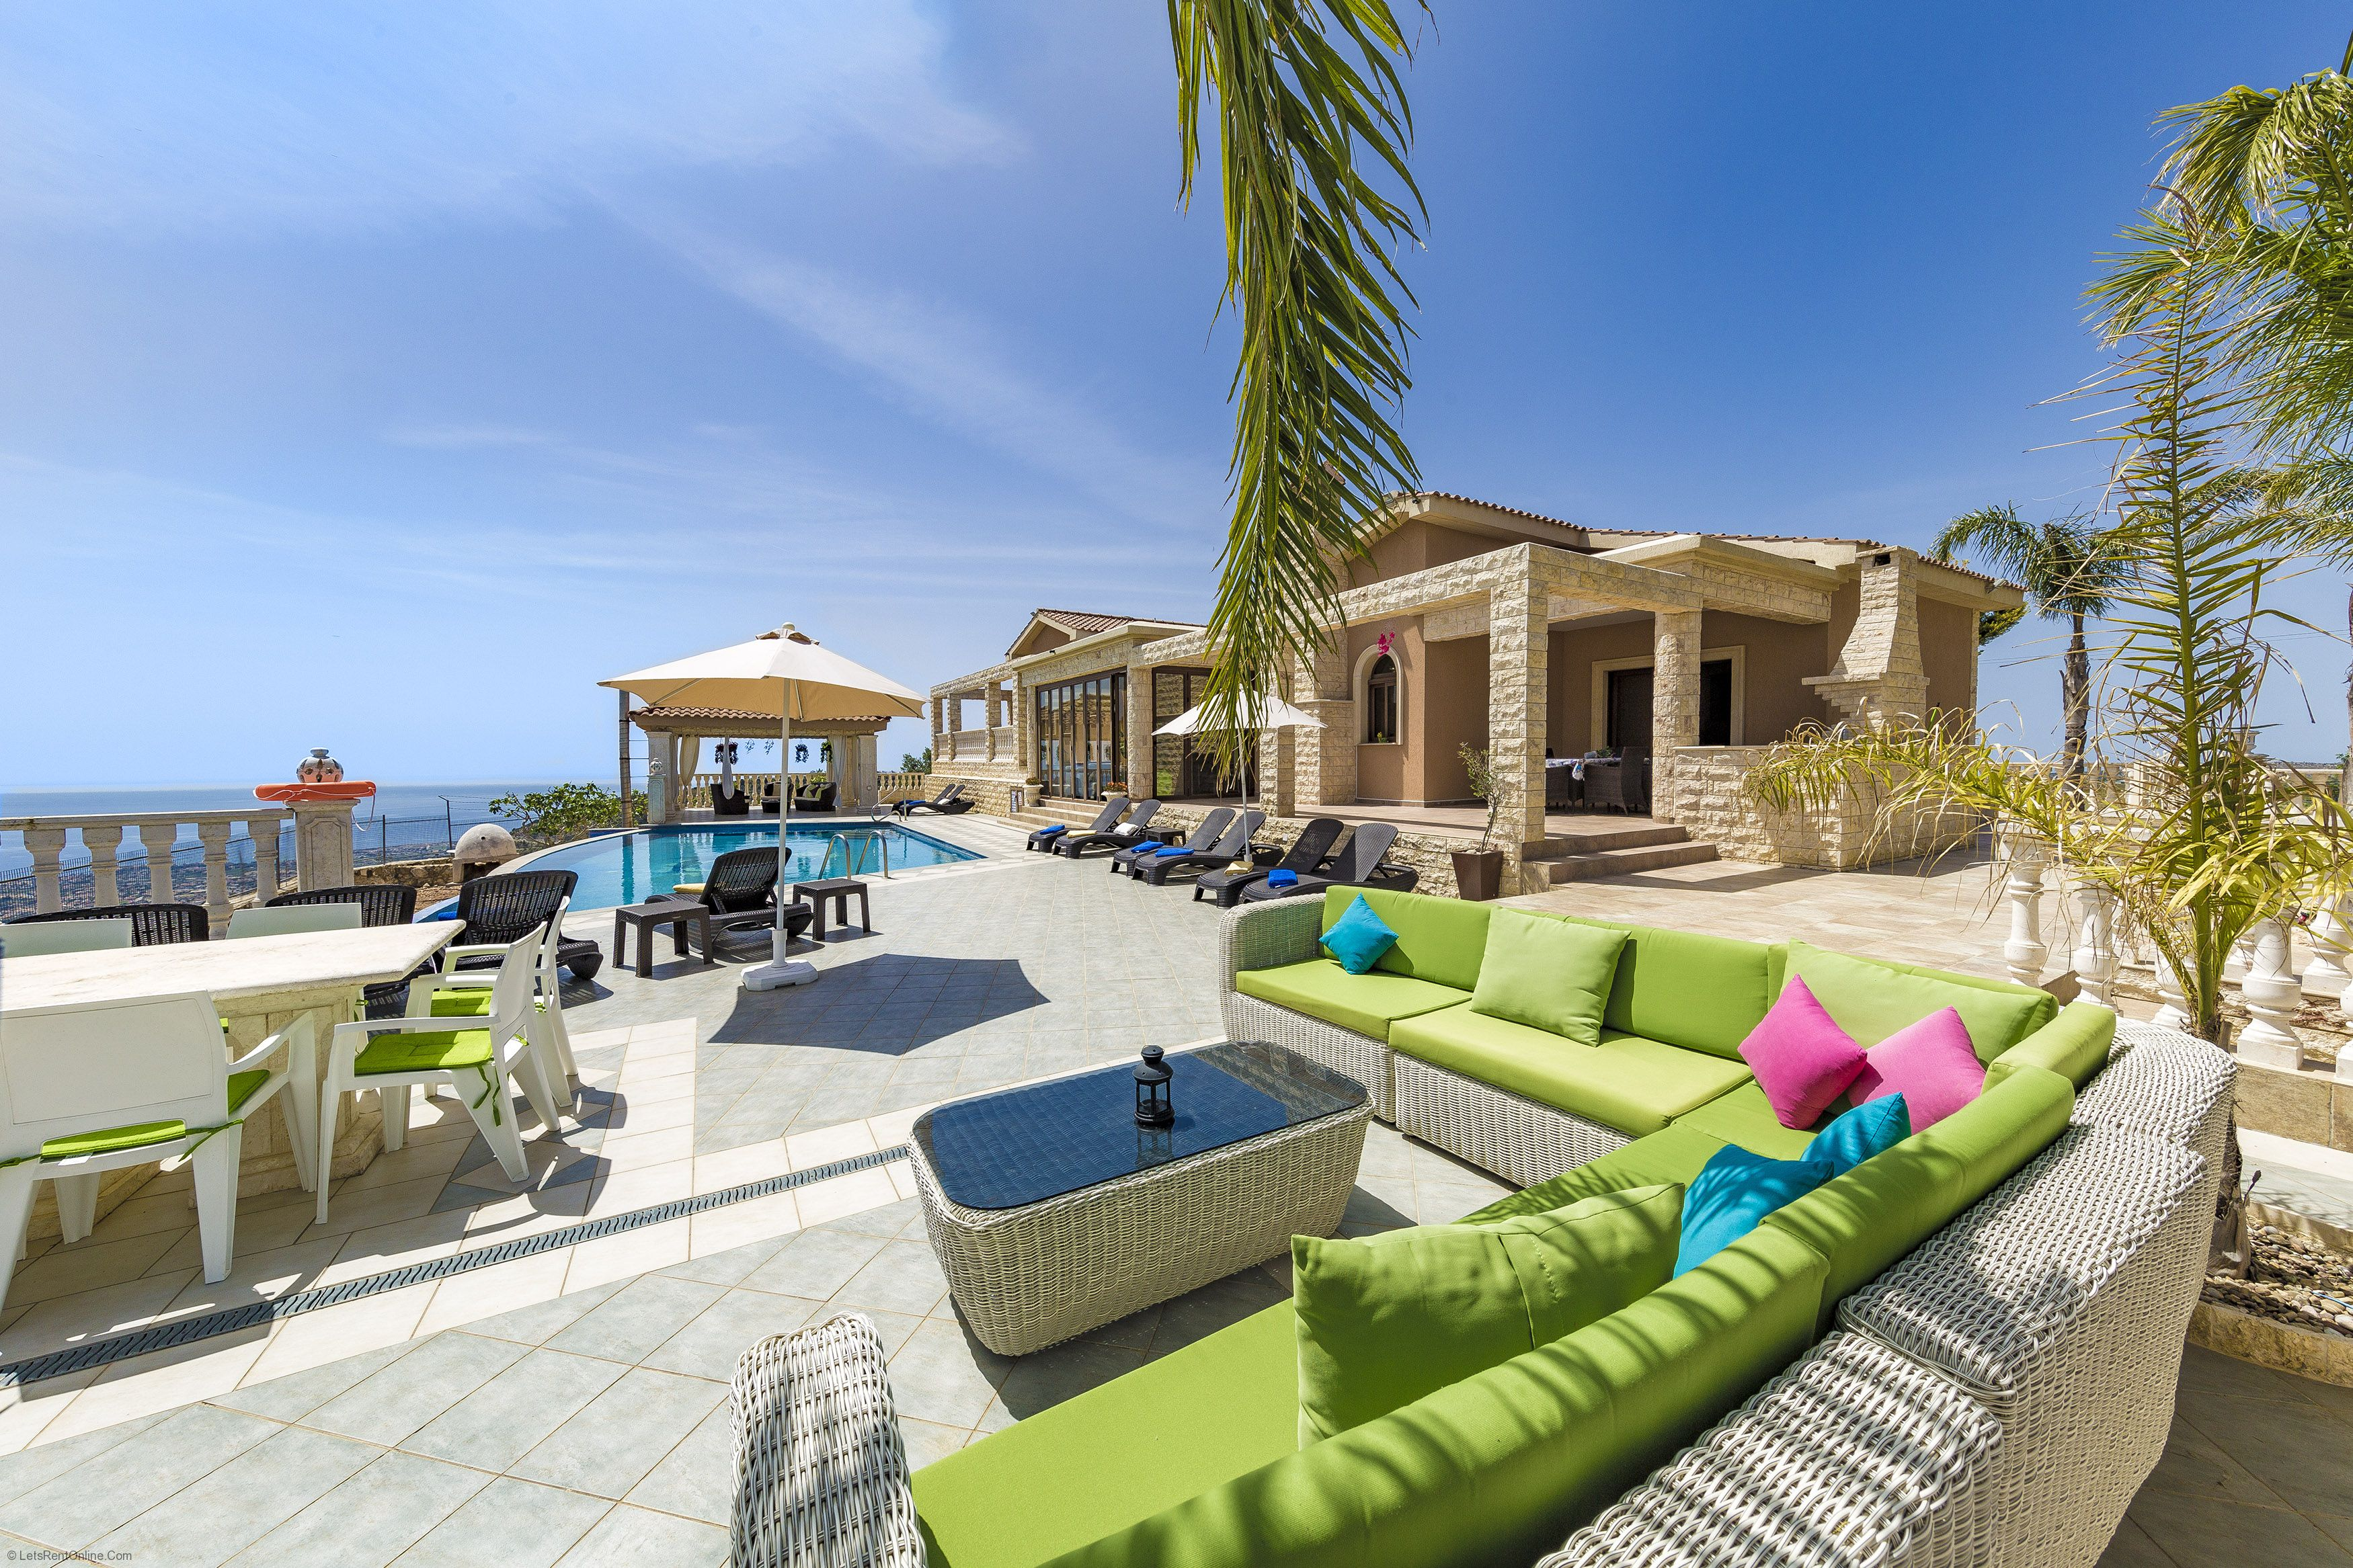 Kathikas Villa Kyparissos - 4 Bedroom Villa with Private Pool